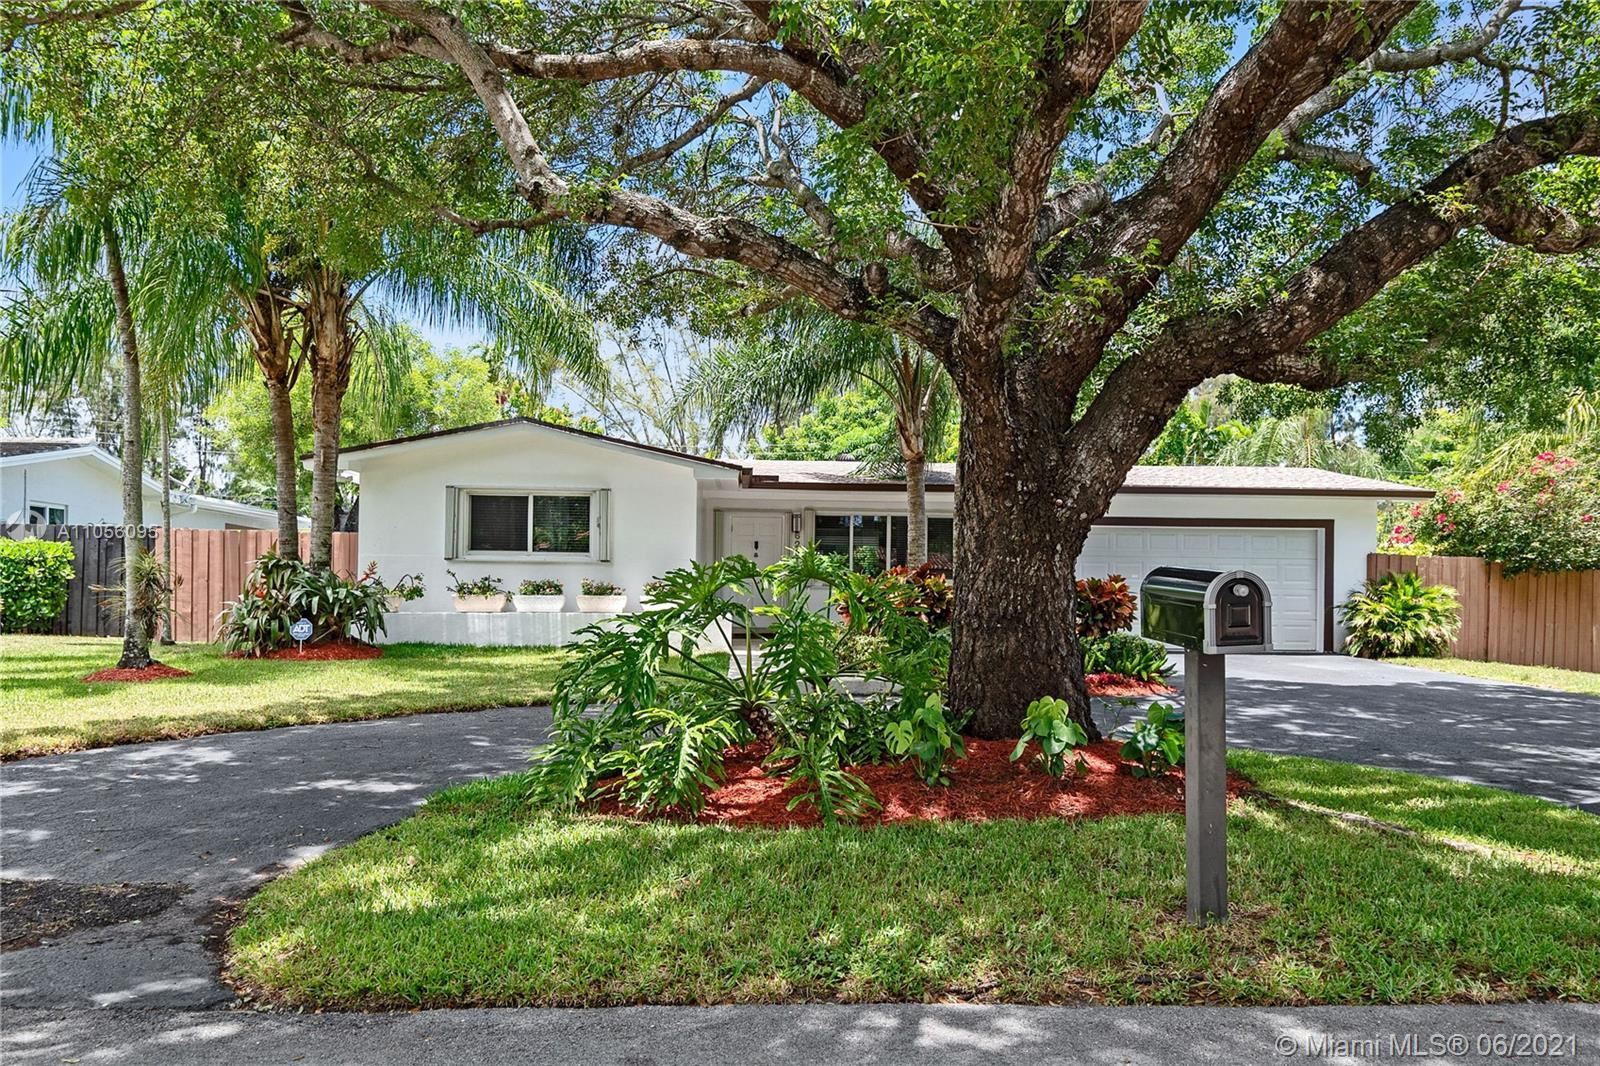 6231 SW 58th St, South Miami, FL 33143 - #: A11056095